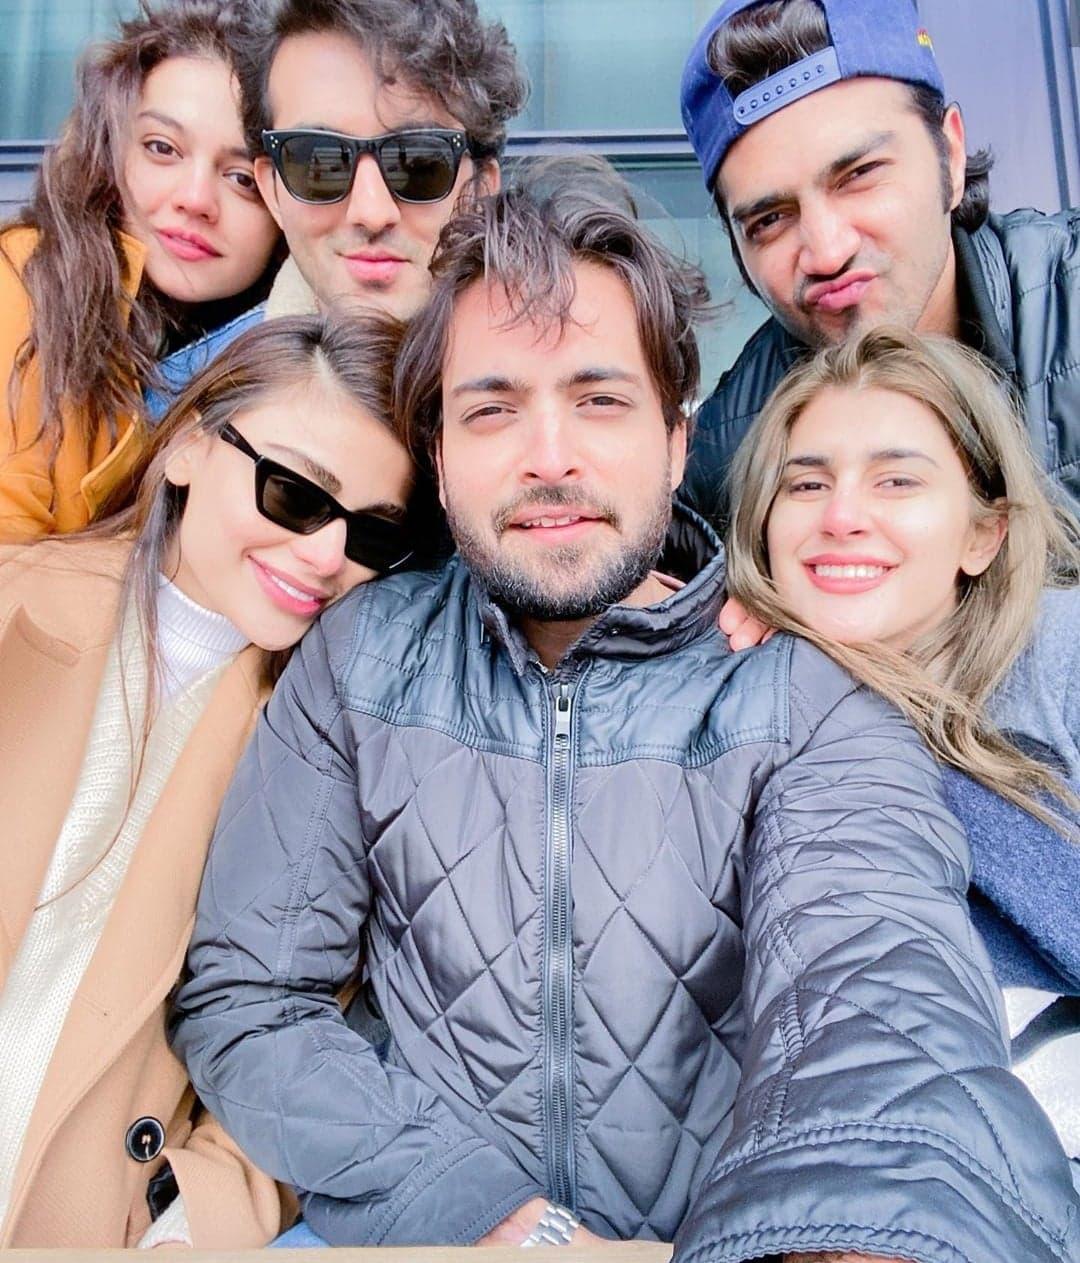 Top 10 Pakistani Celebrity Selfies of 2019